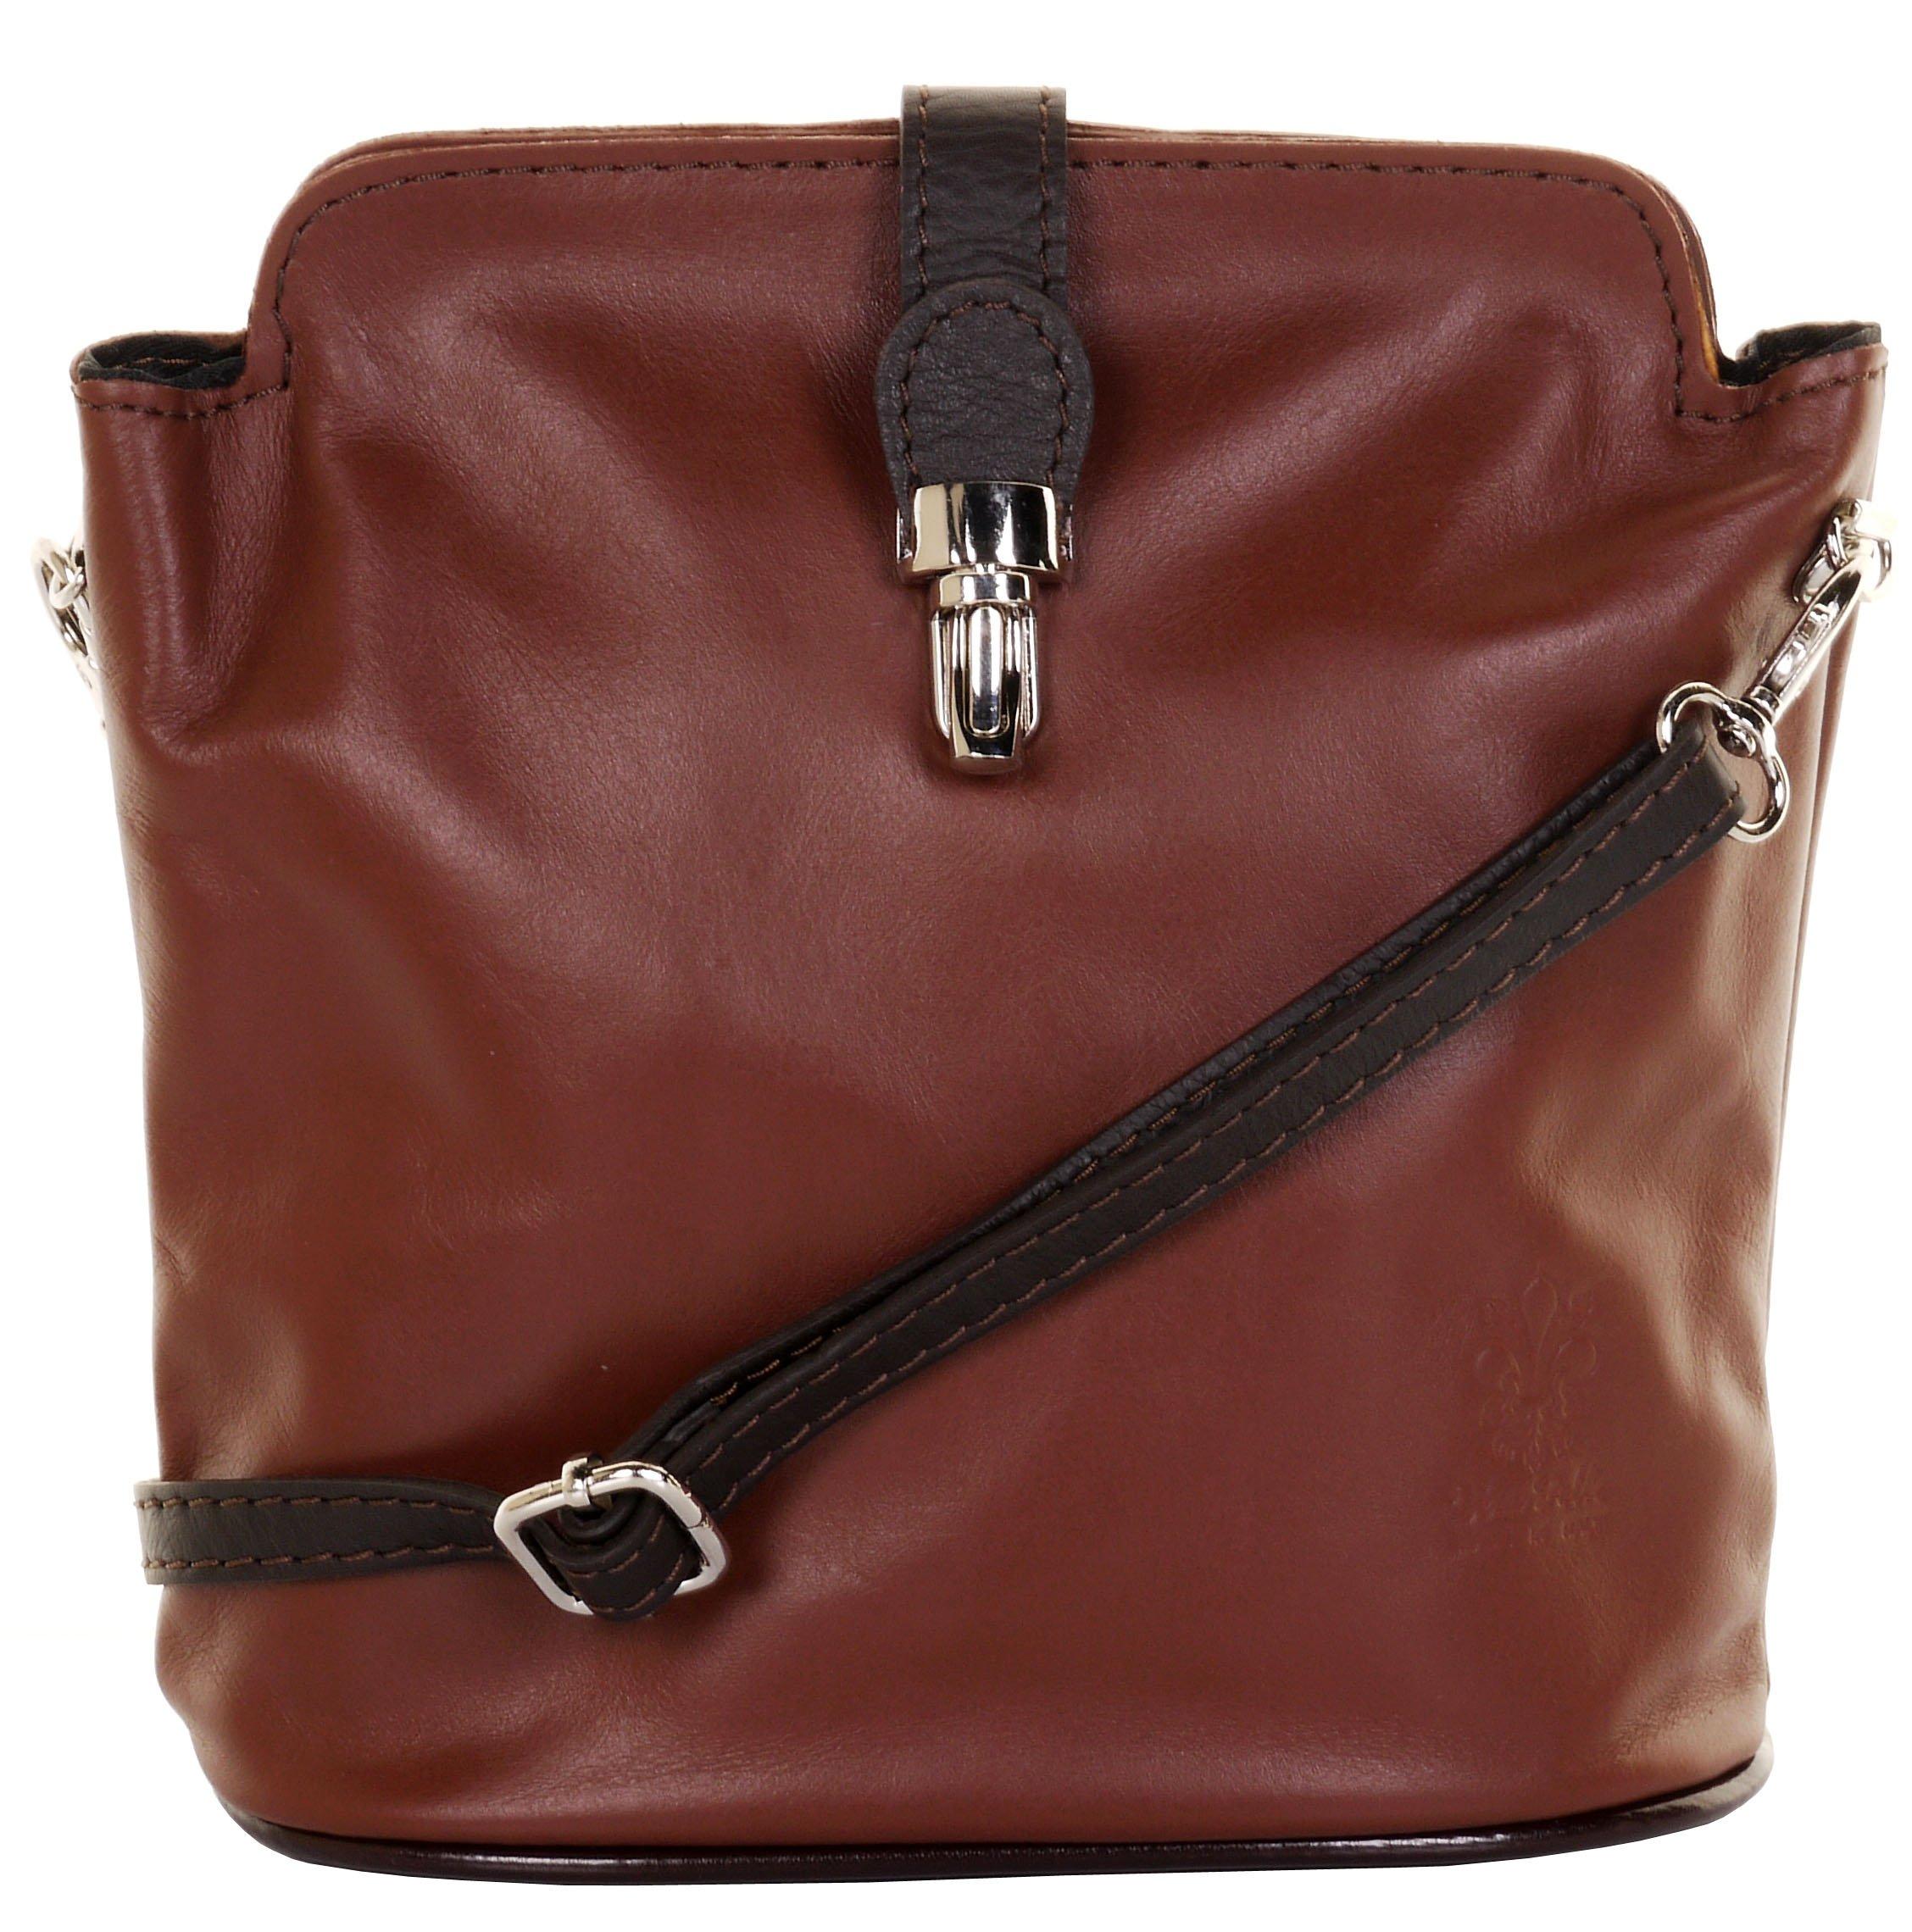 Primo Sacchi Italian Leather Hand Made Small Mid and Dark Brown Cross Body or Shoulder Bag Handbag